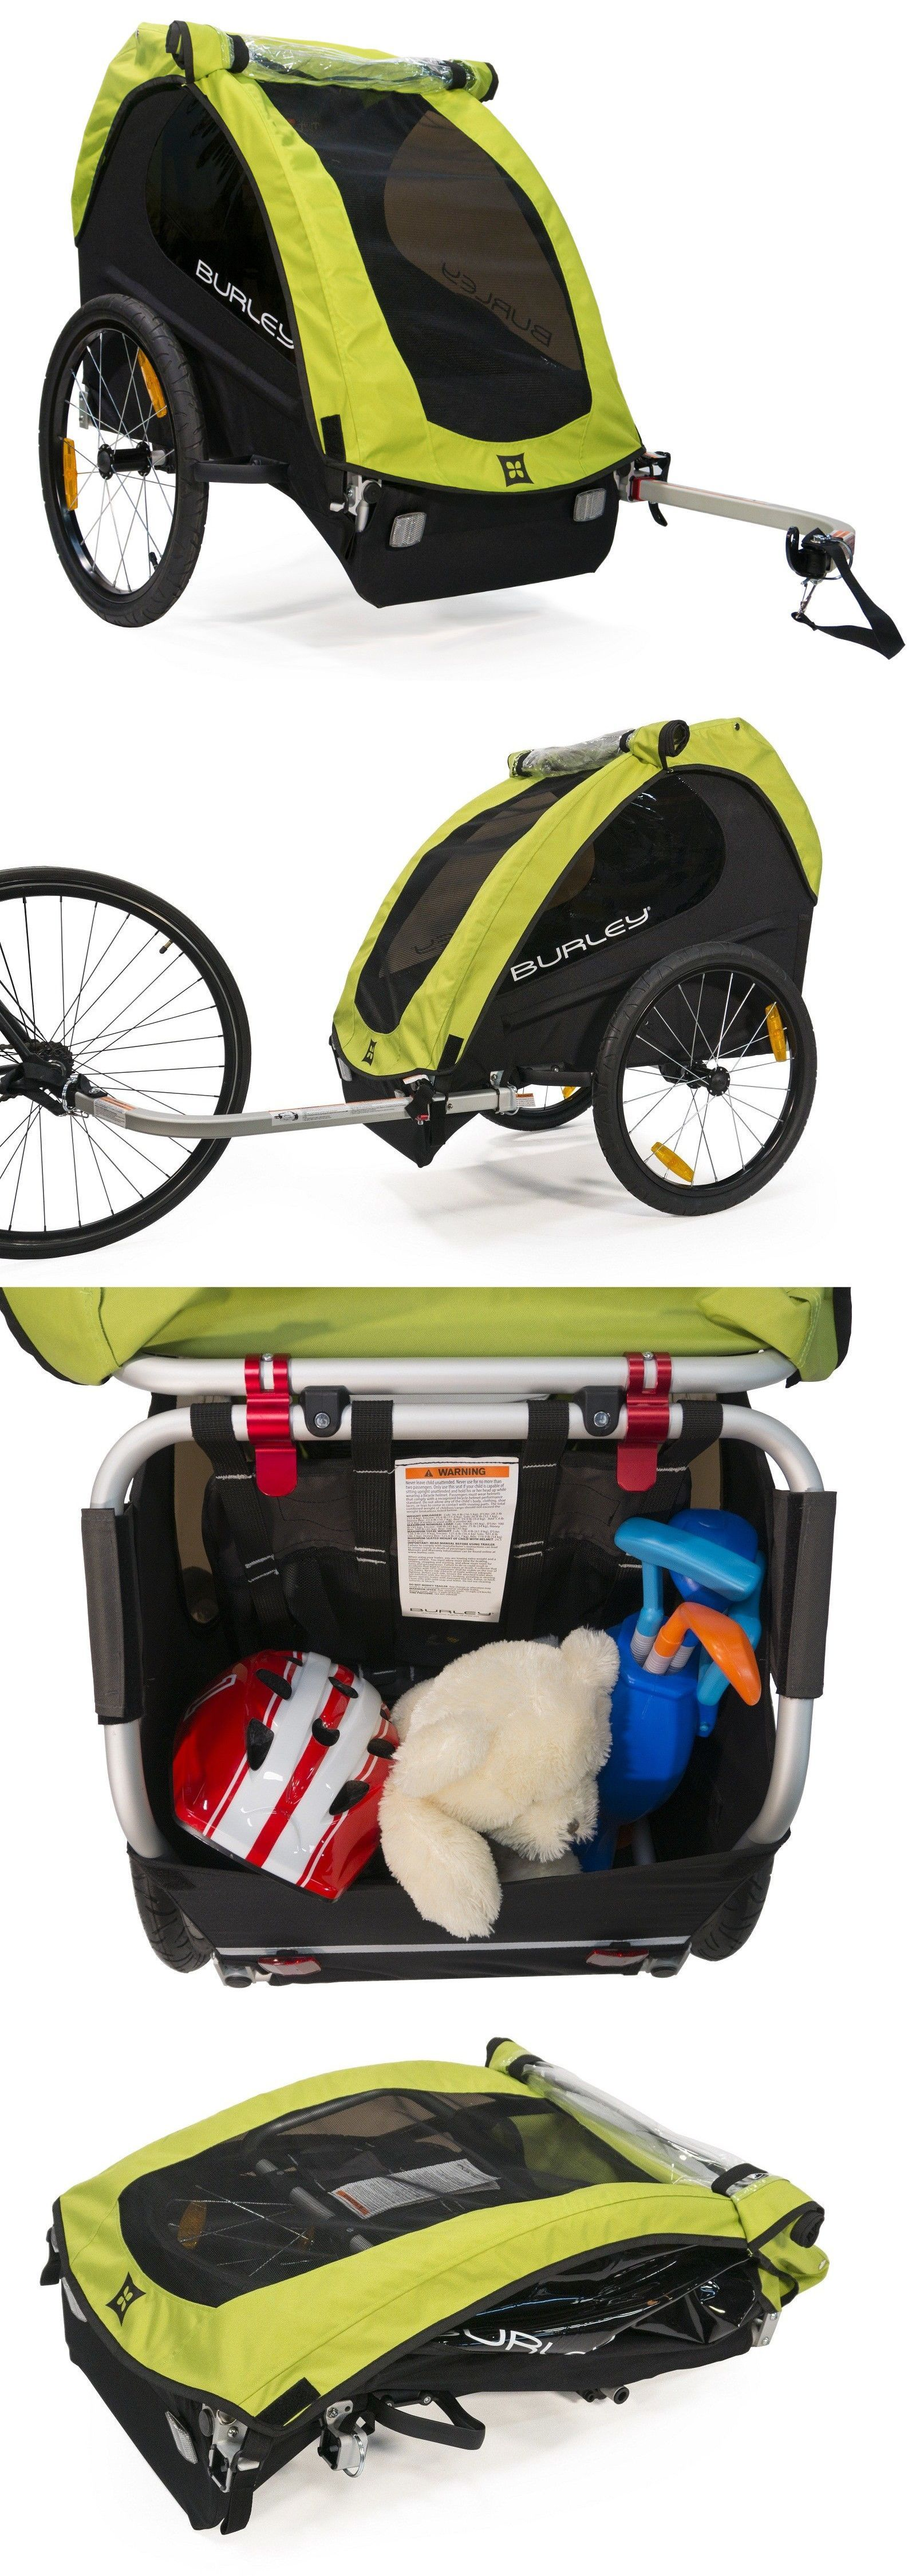 Burley Minnow Compact Fold Bike Bicycle Trailer For Single Kid Child Green NEW